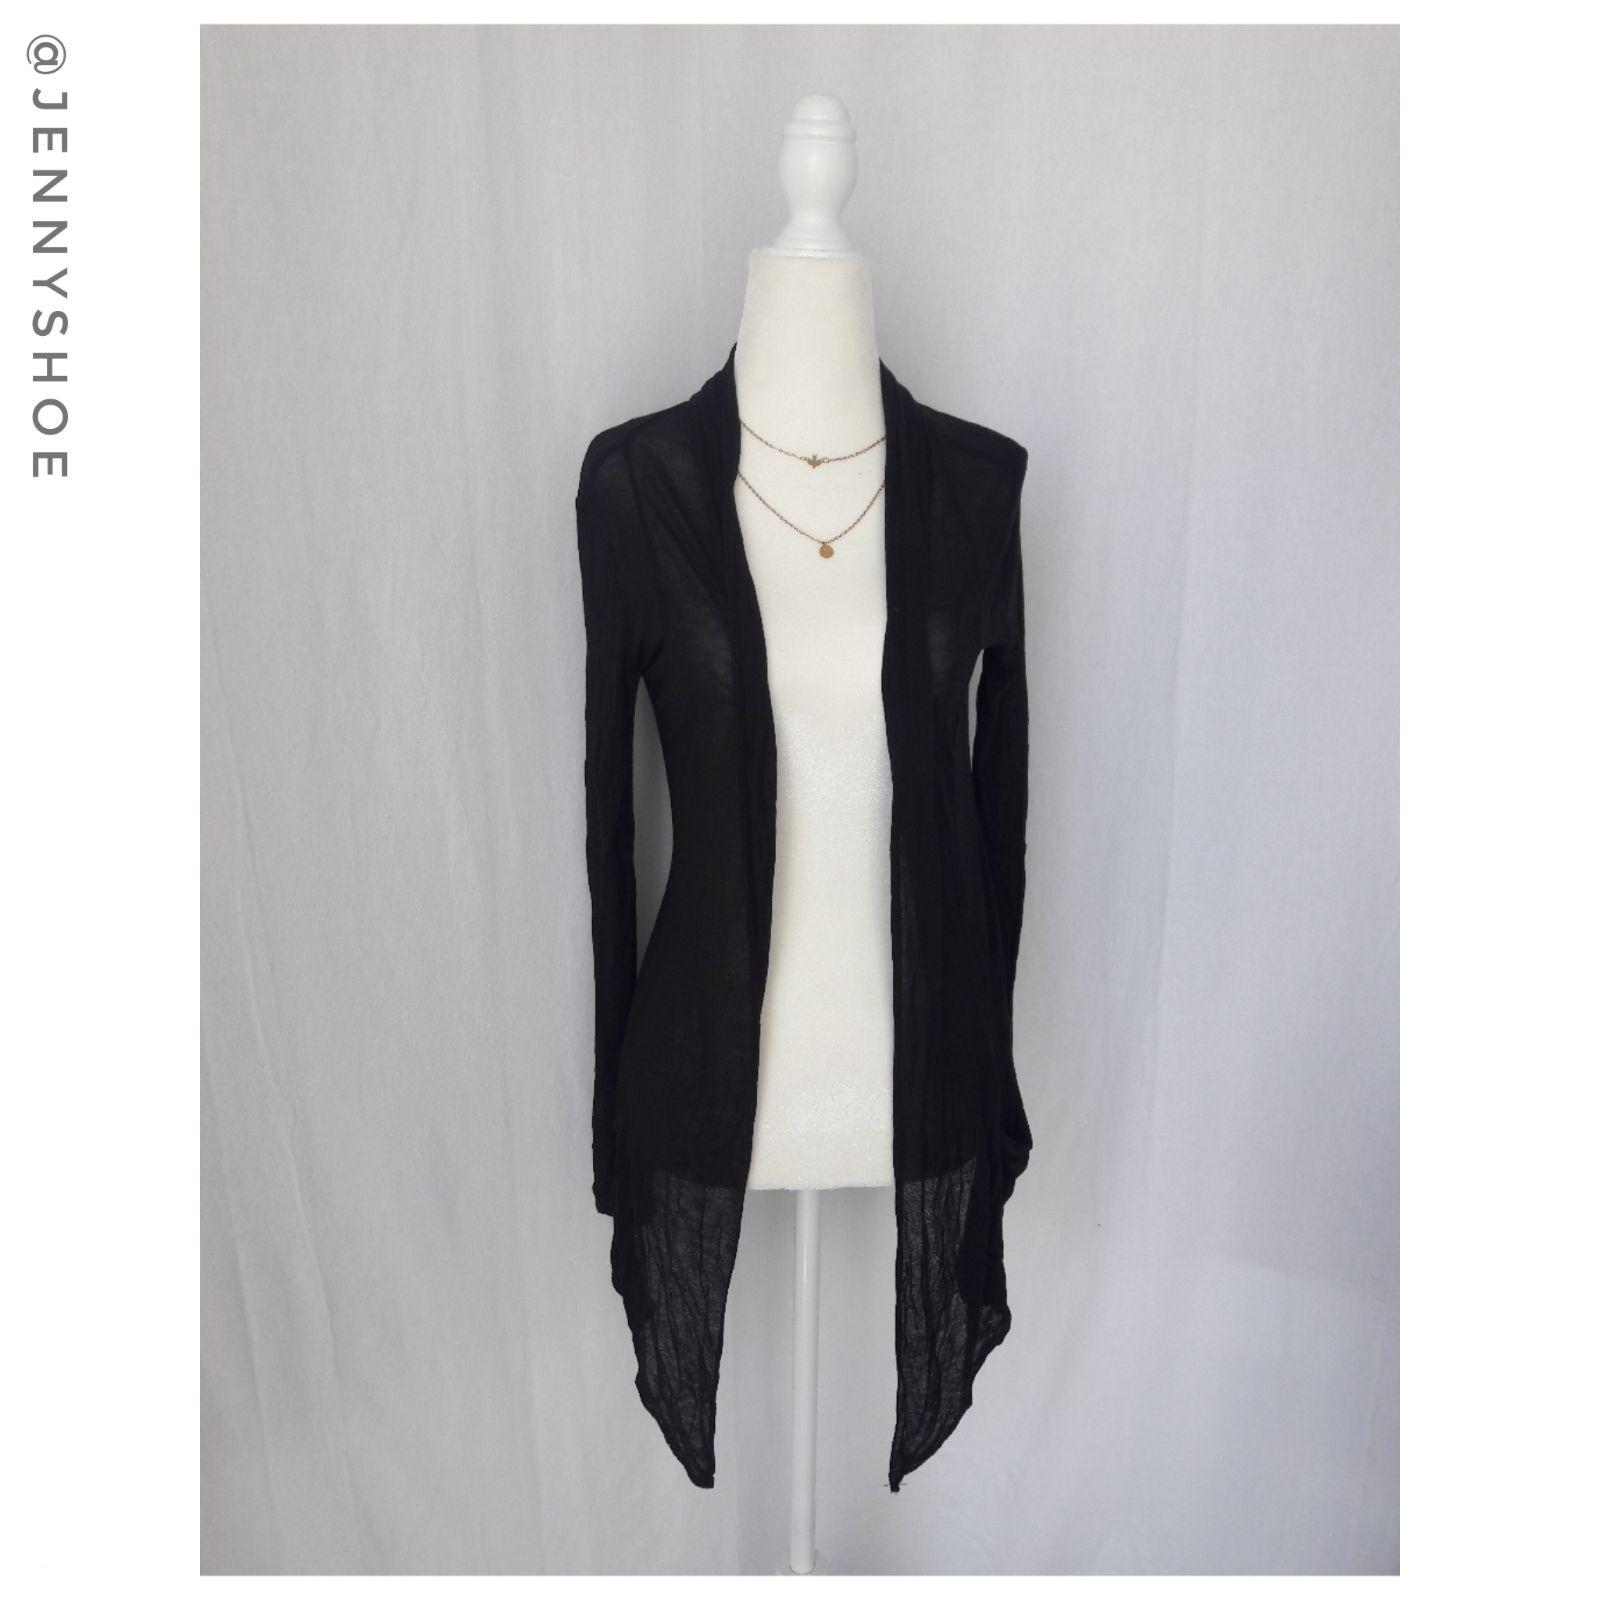 Forever 21 lightweight black cardigan - Mercari: BUY & SELL THINGS ...